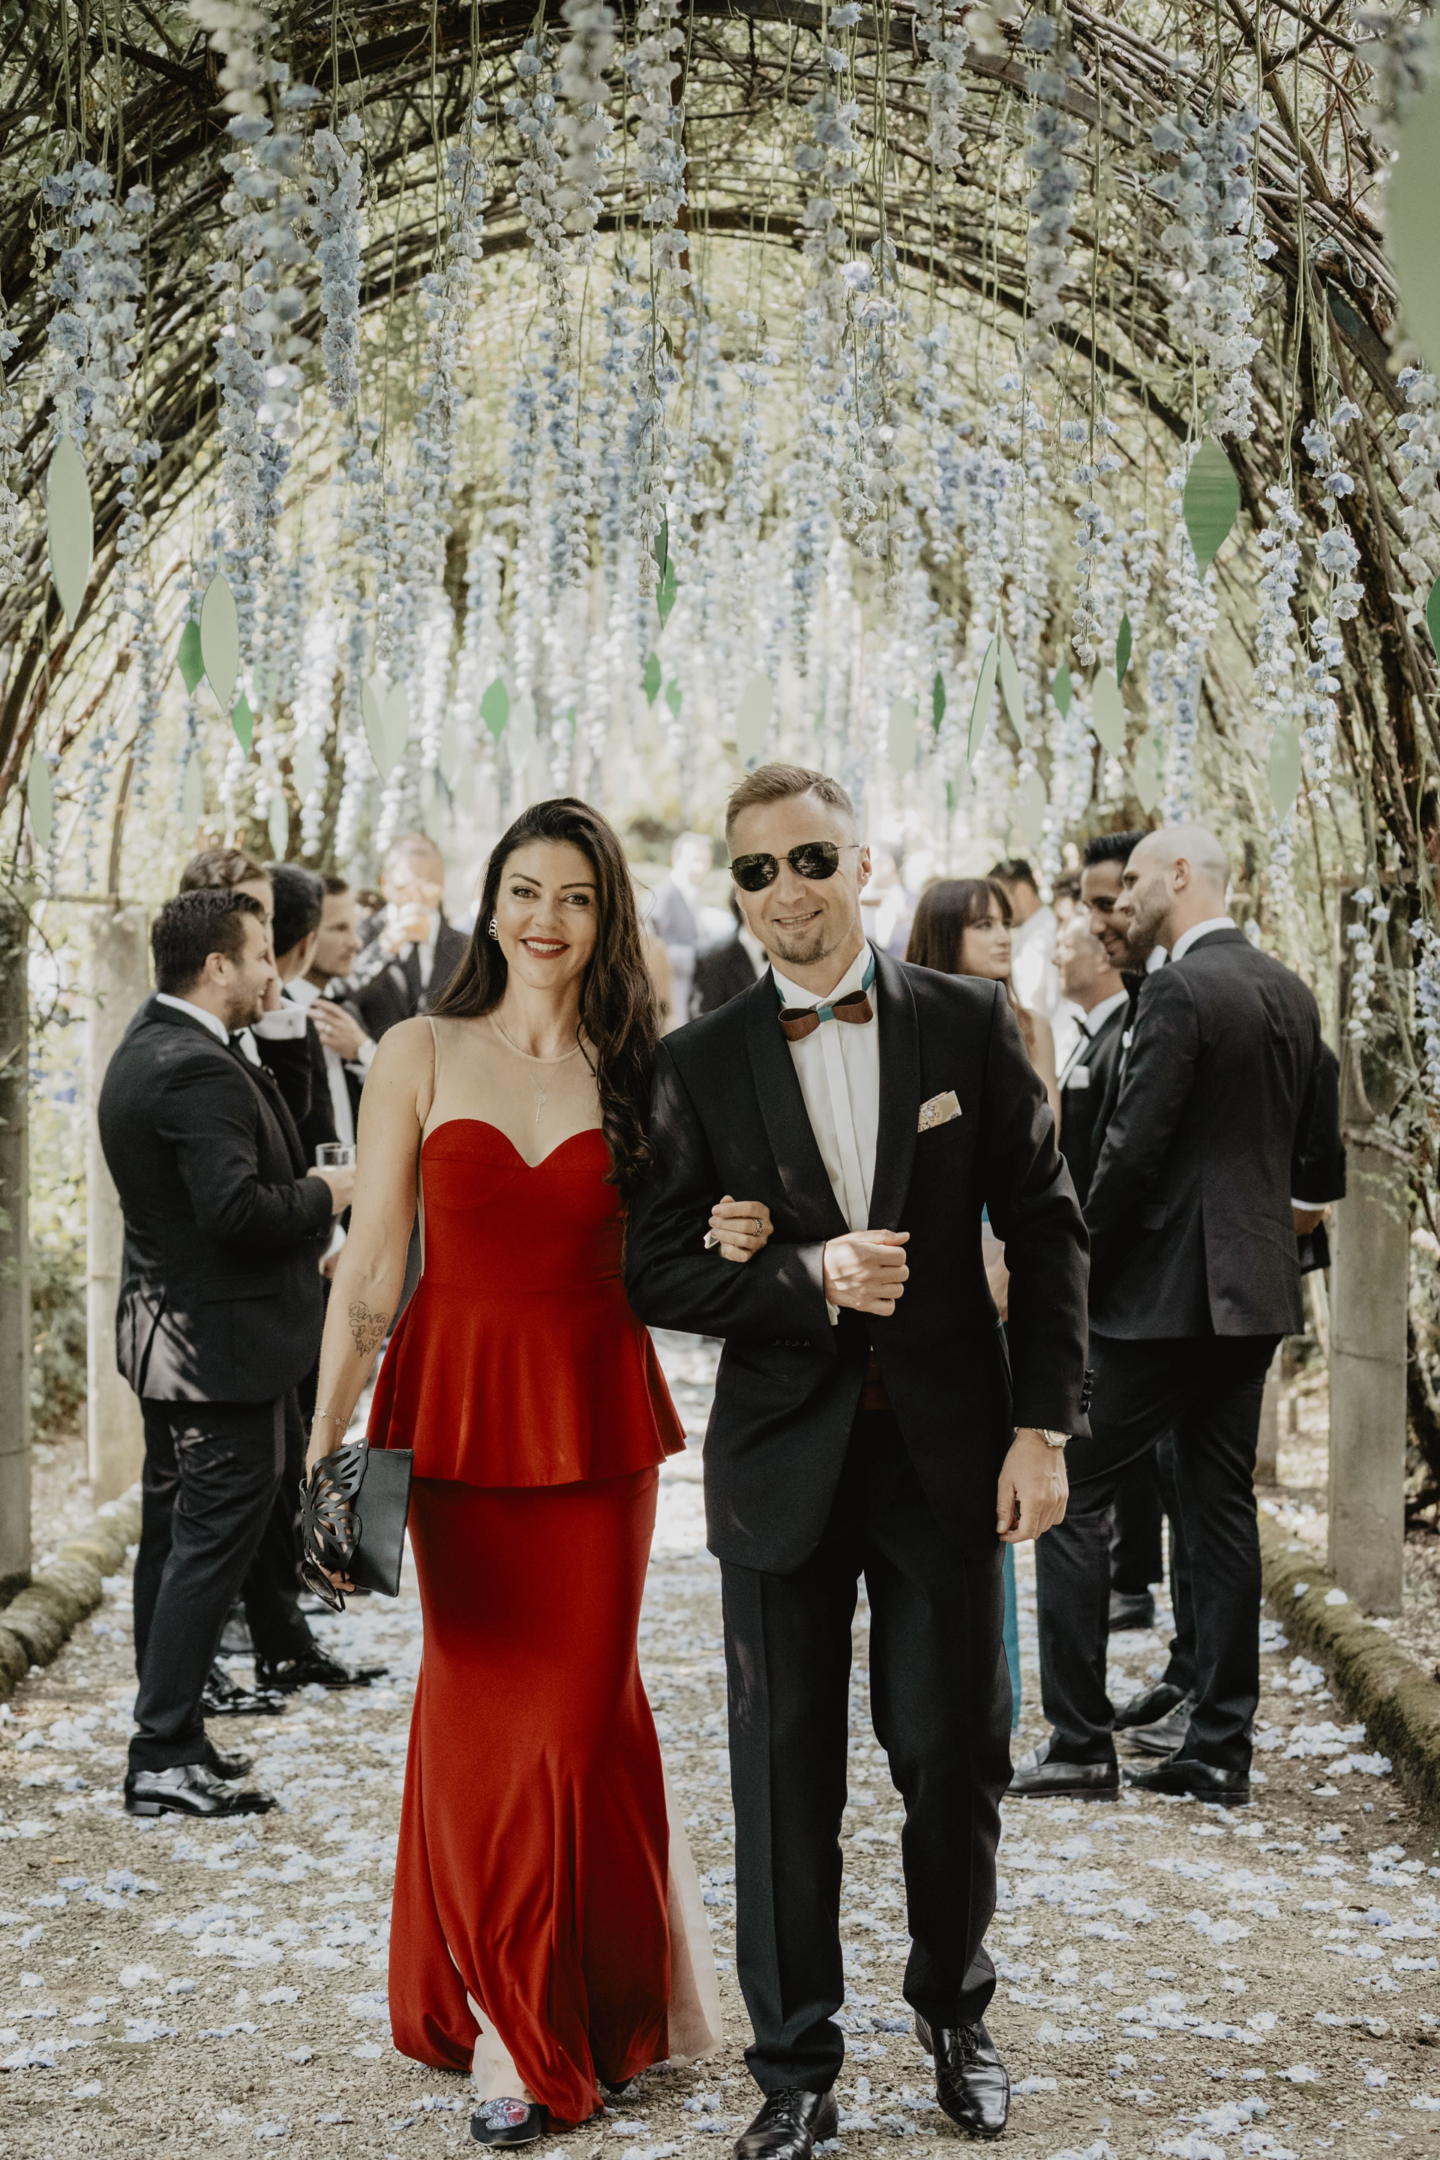 A sparkling wedding in the shore of the Arno - 32 :: A sparkling wedding on the shore of the Arno :: Luxury wedding photography - 31 :: A sparkling wedding in the shore of the Arno - 32